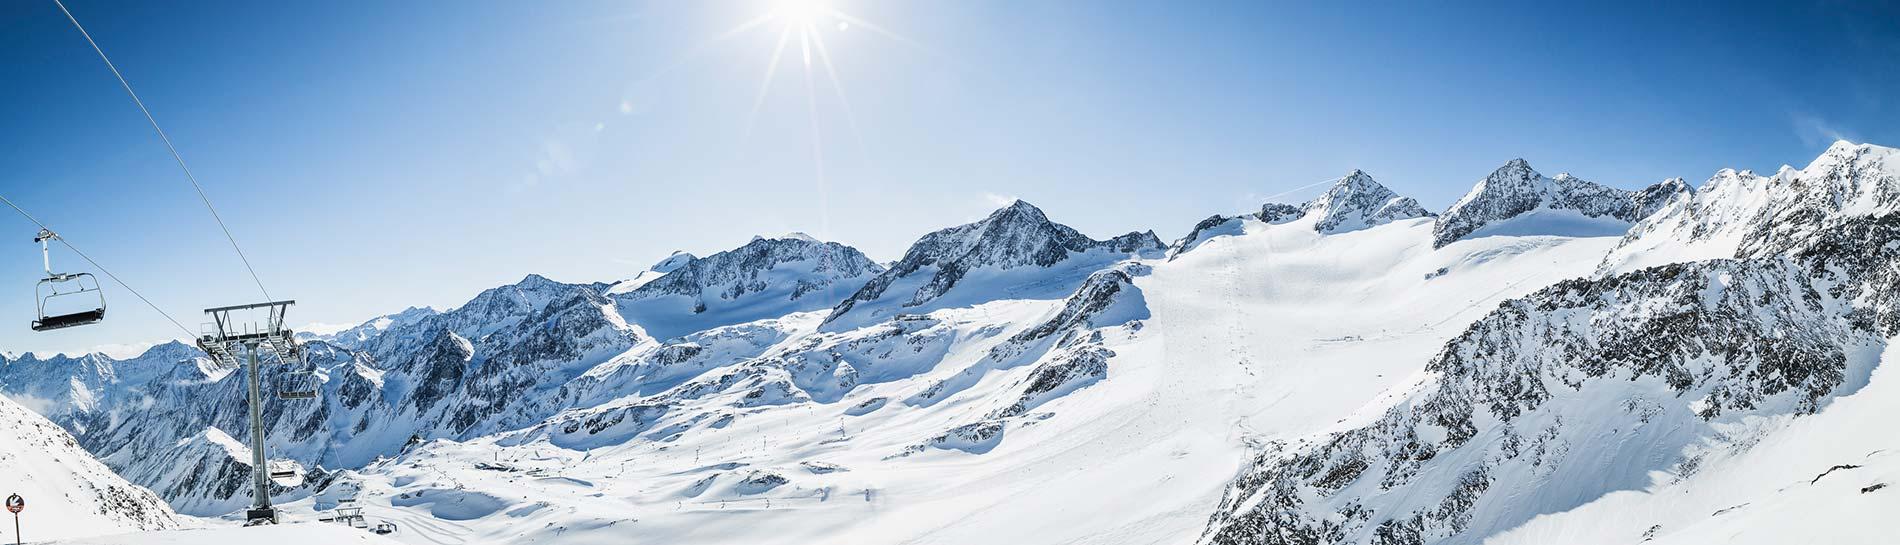 Winter holiday SPA-HOTEL Jagdhof Neustift Tyrol